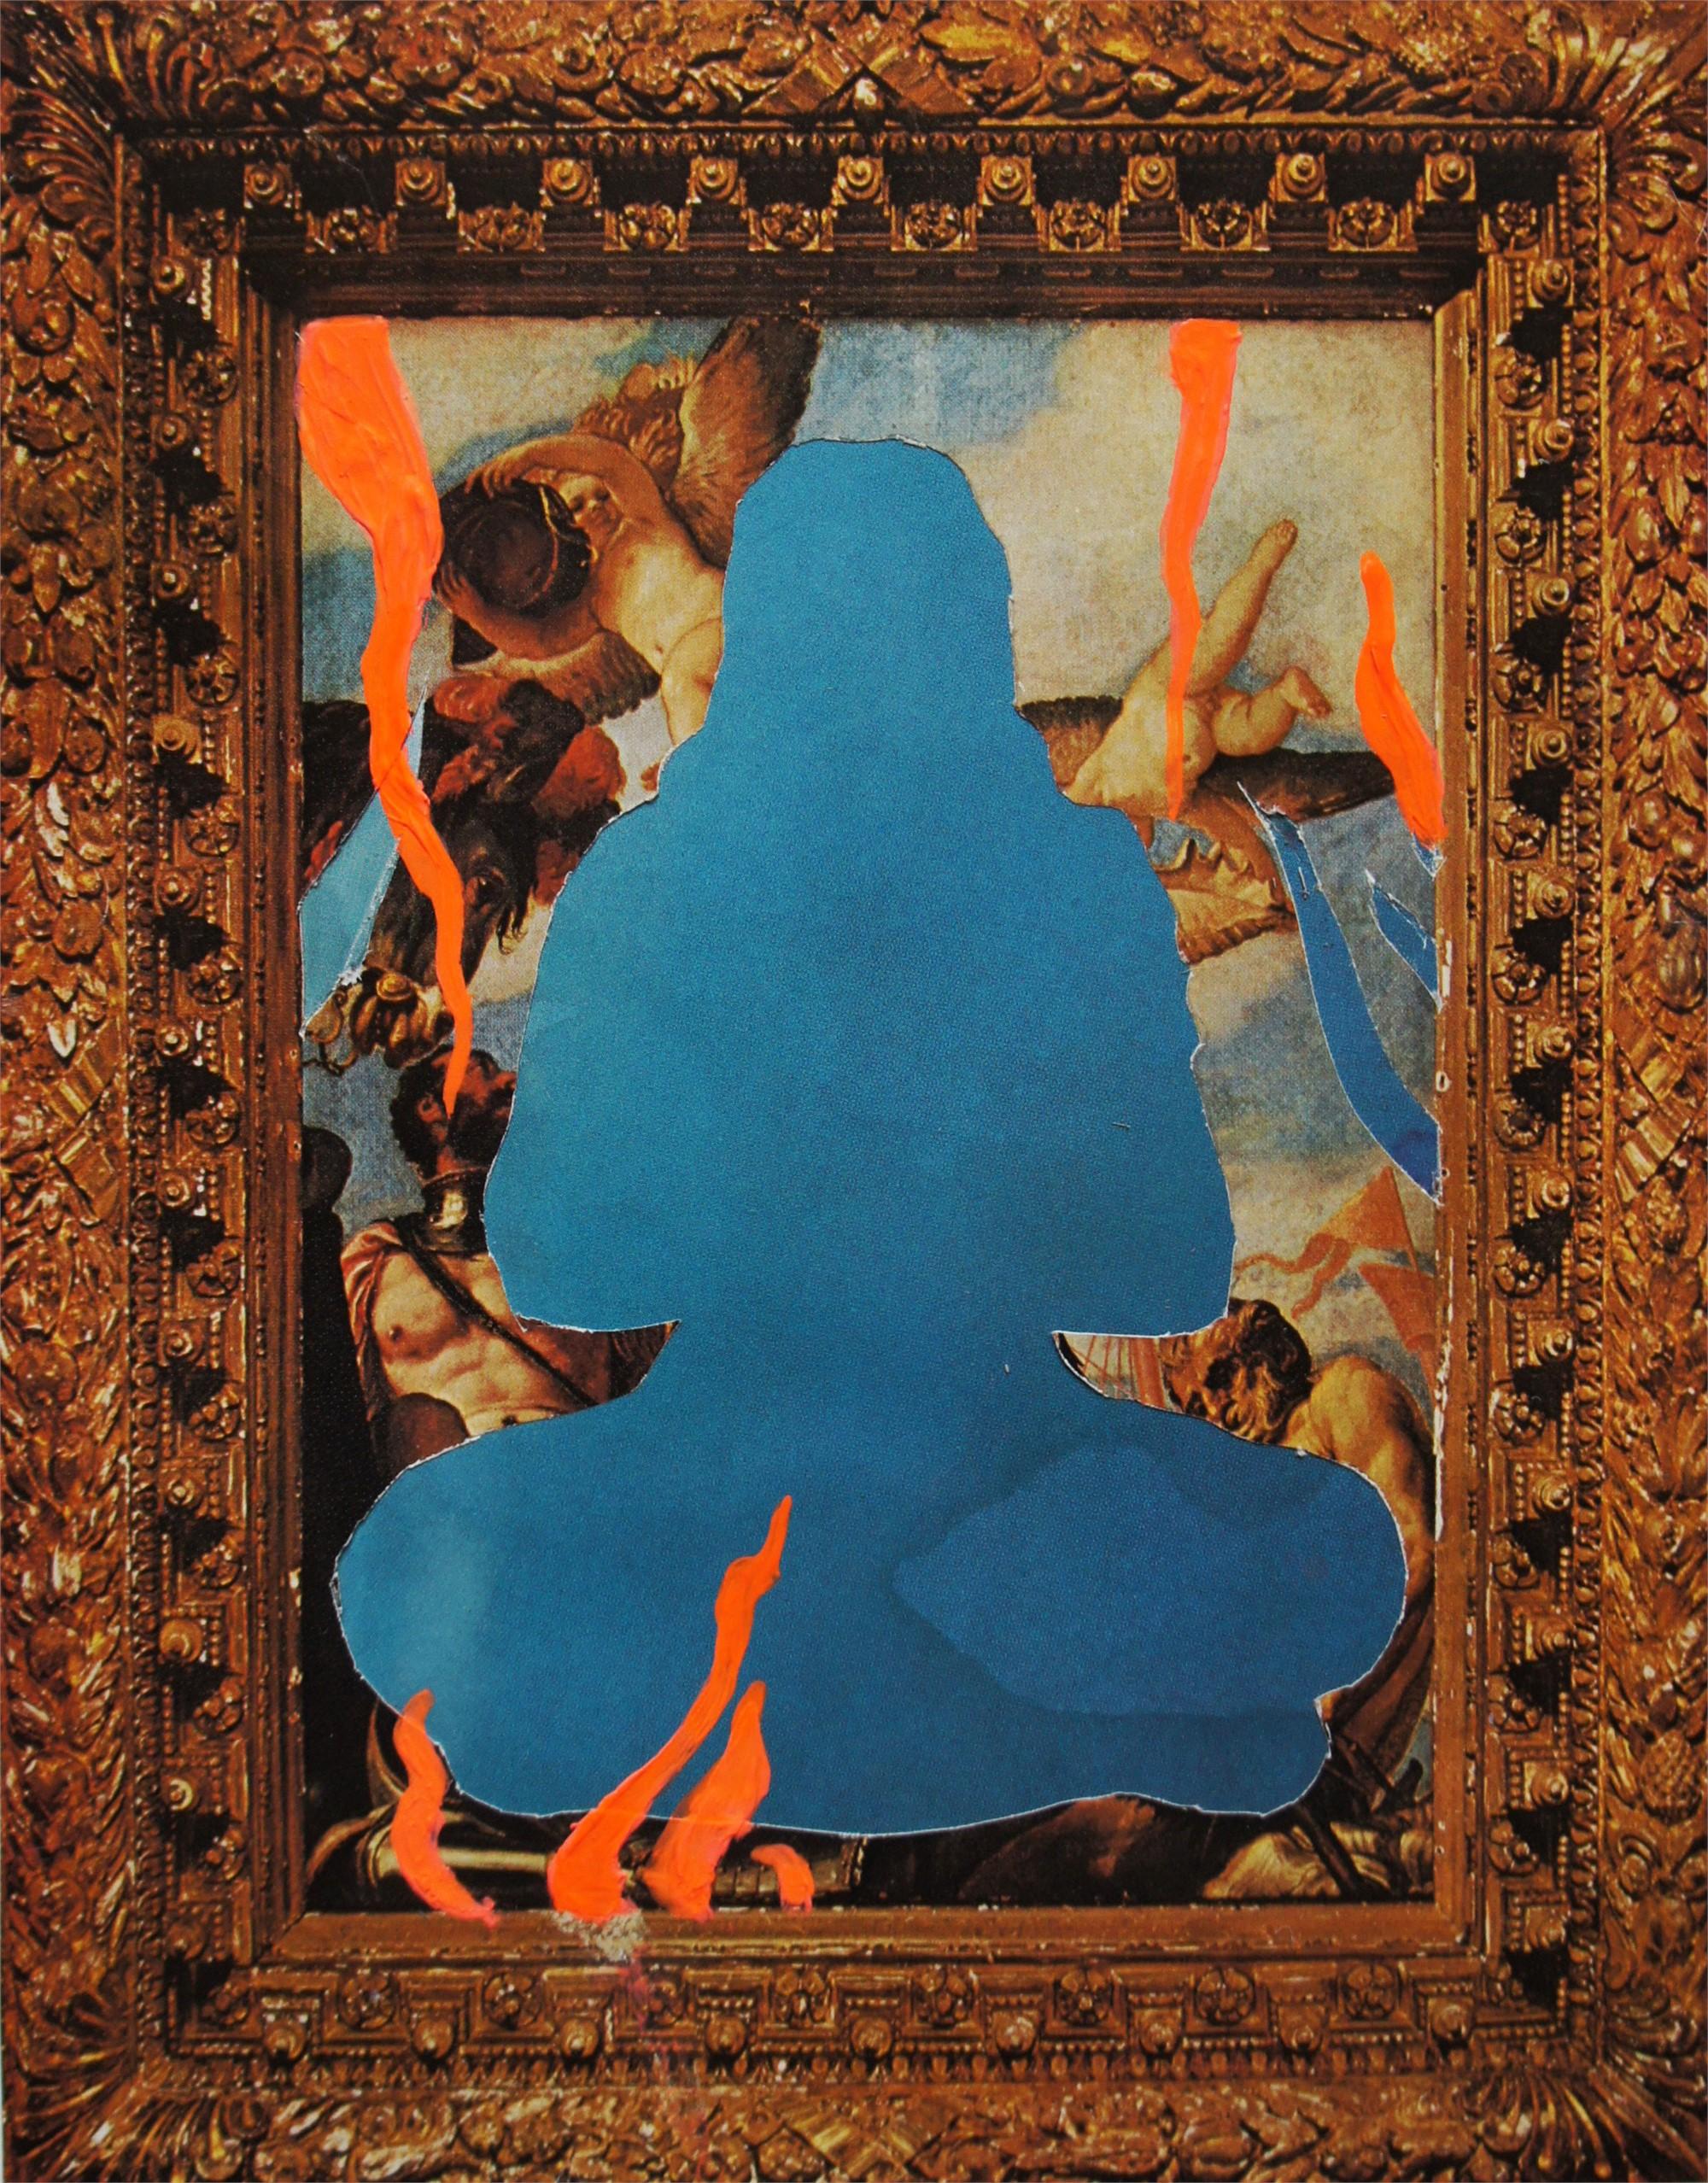 Within the Frame by Suchitra Mattai